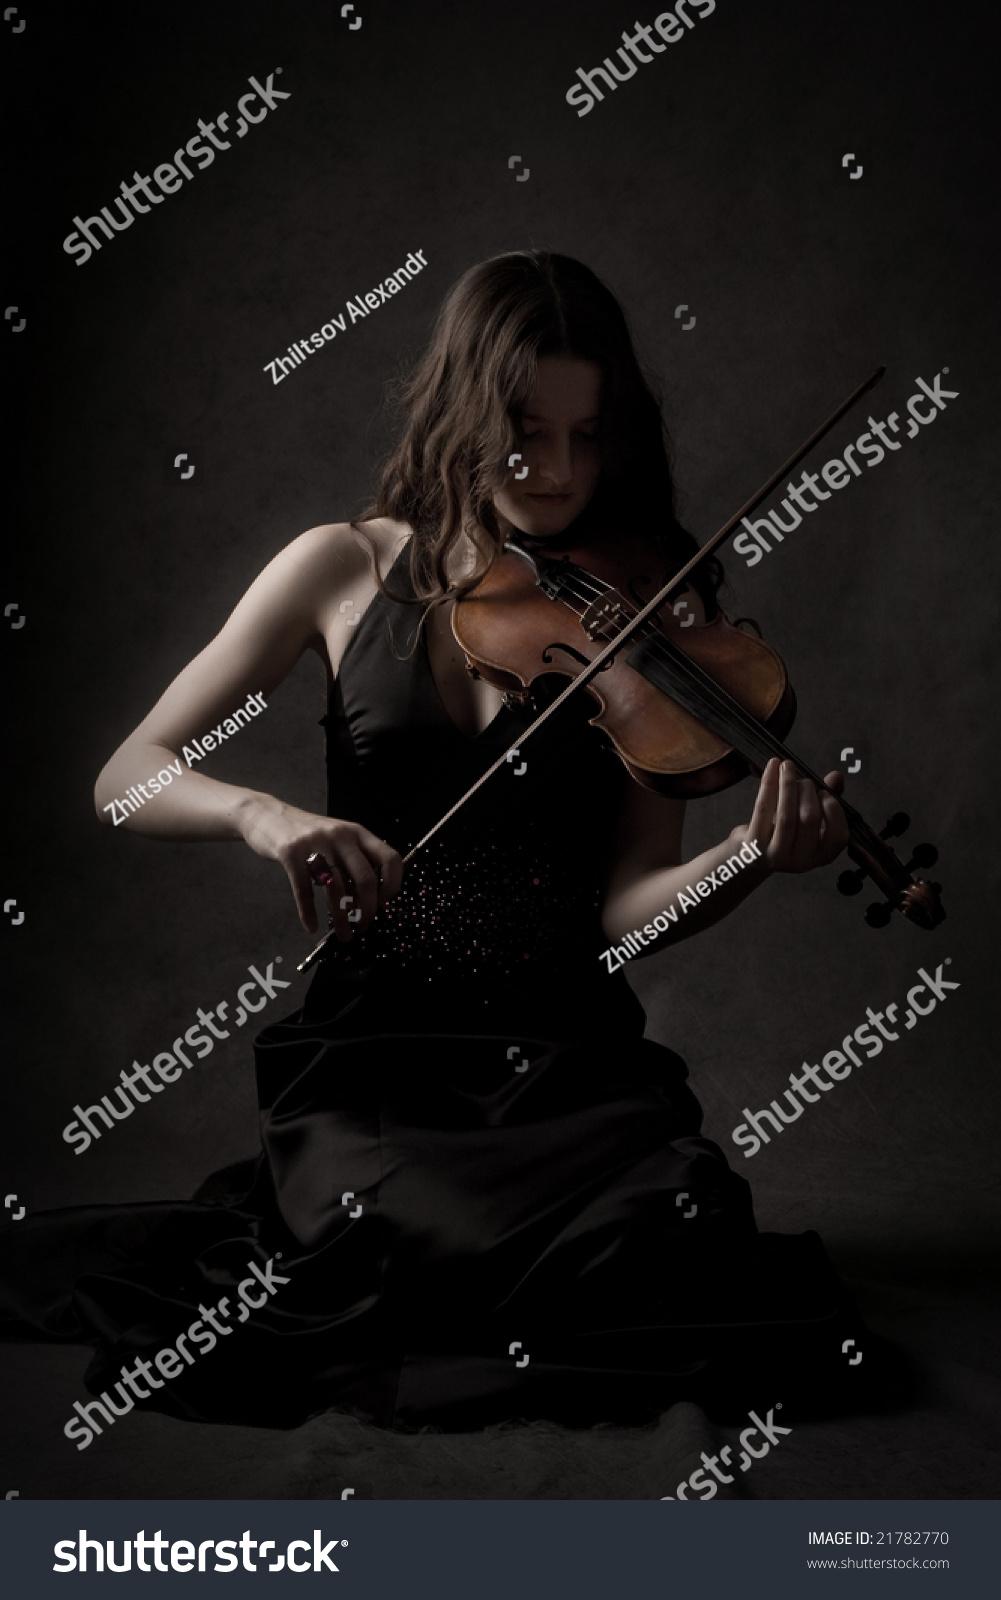 Sad Girl Play On Violin Dark Stock Photo 21782770 ...